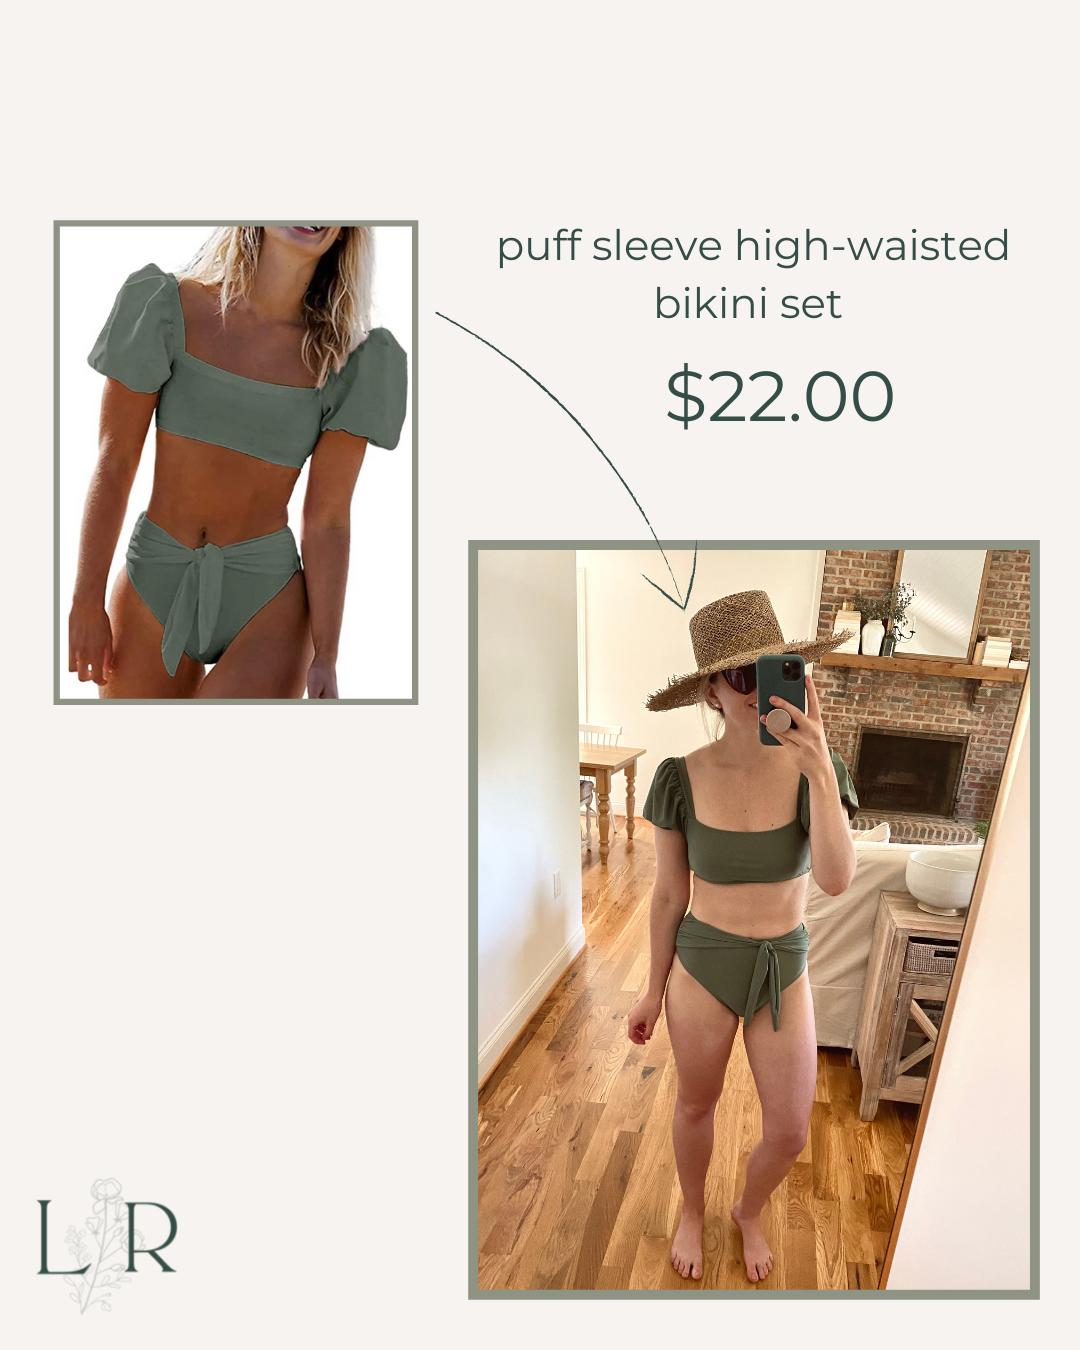 Affordable High-waisted bikini for Summer   Louella Reese